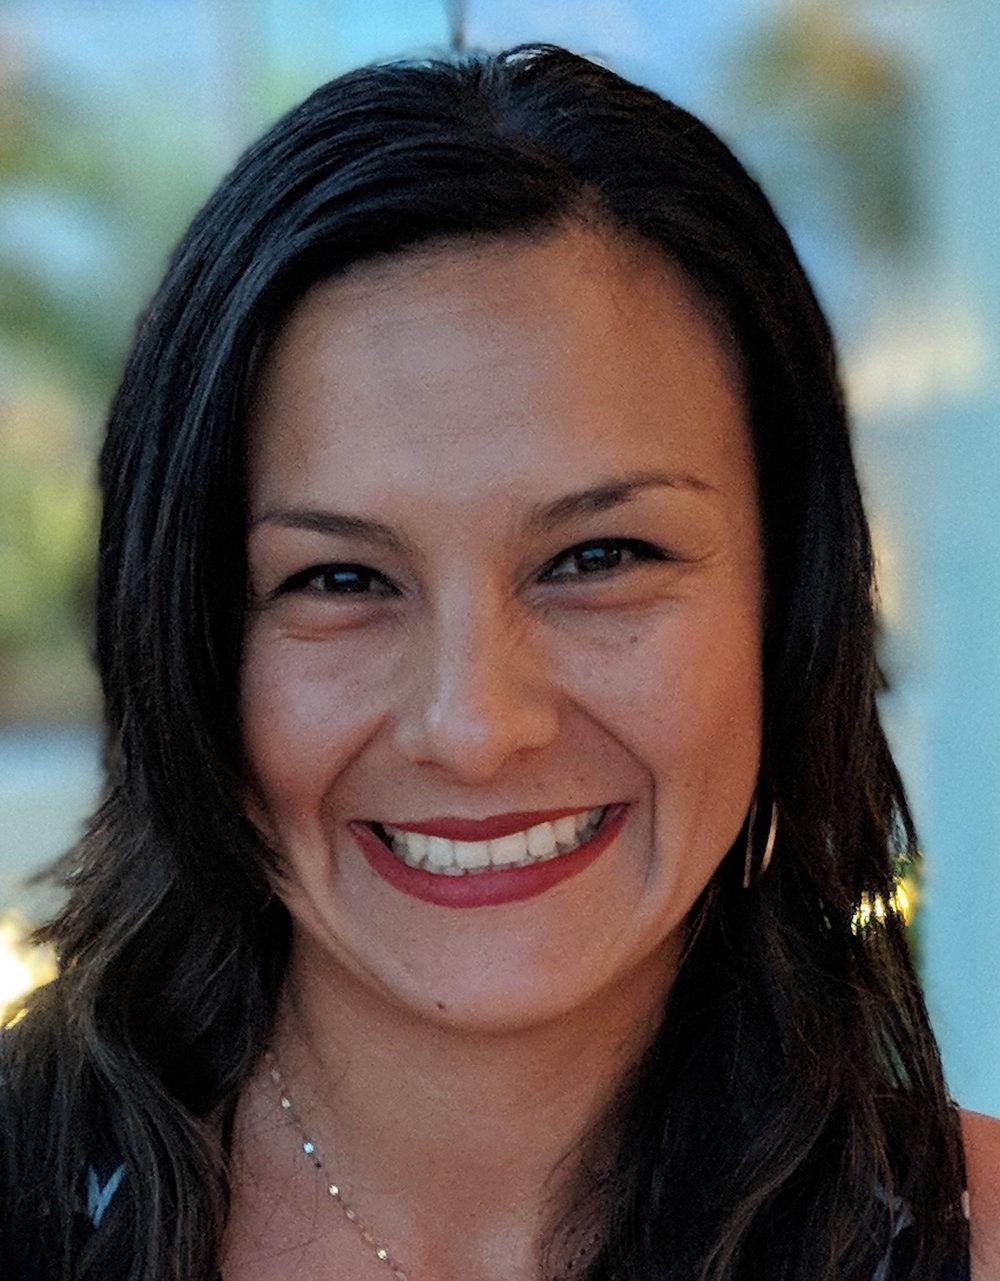 KATHERINE PERRY - ECE PROFESSIONALMONTESSORI-ANPARENT CONSULTANT